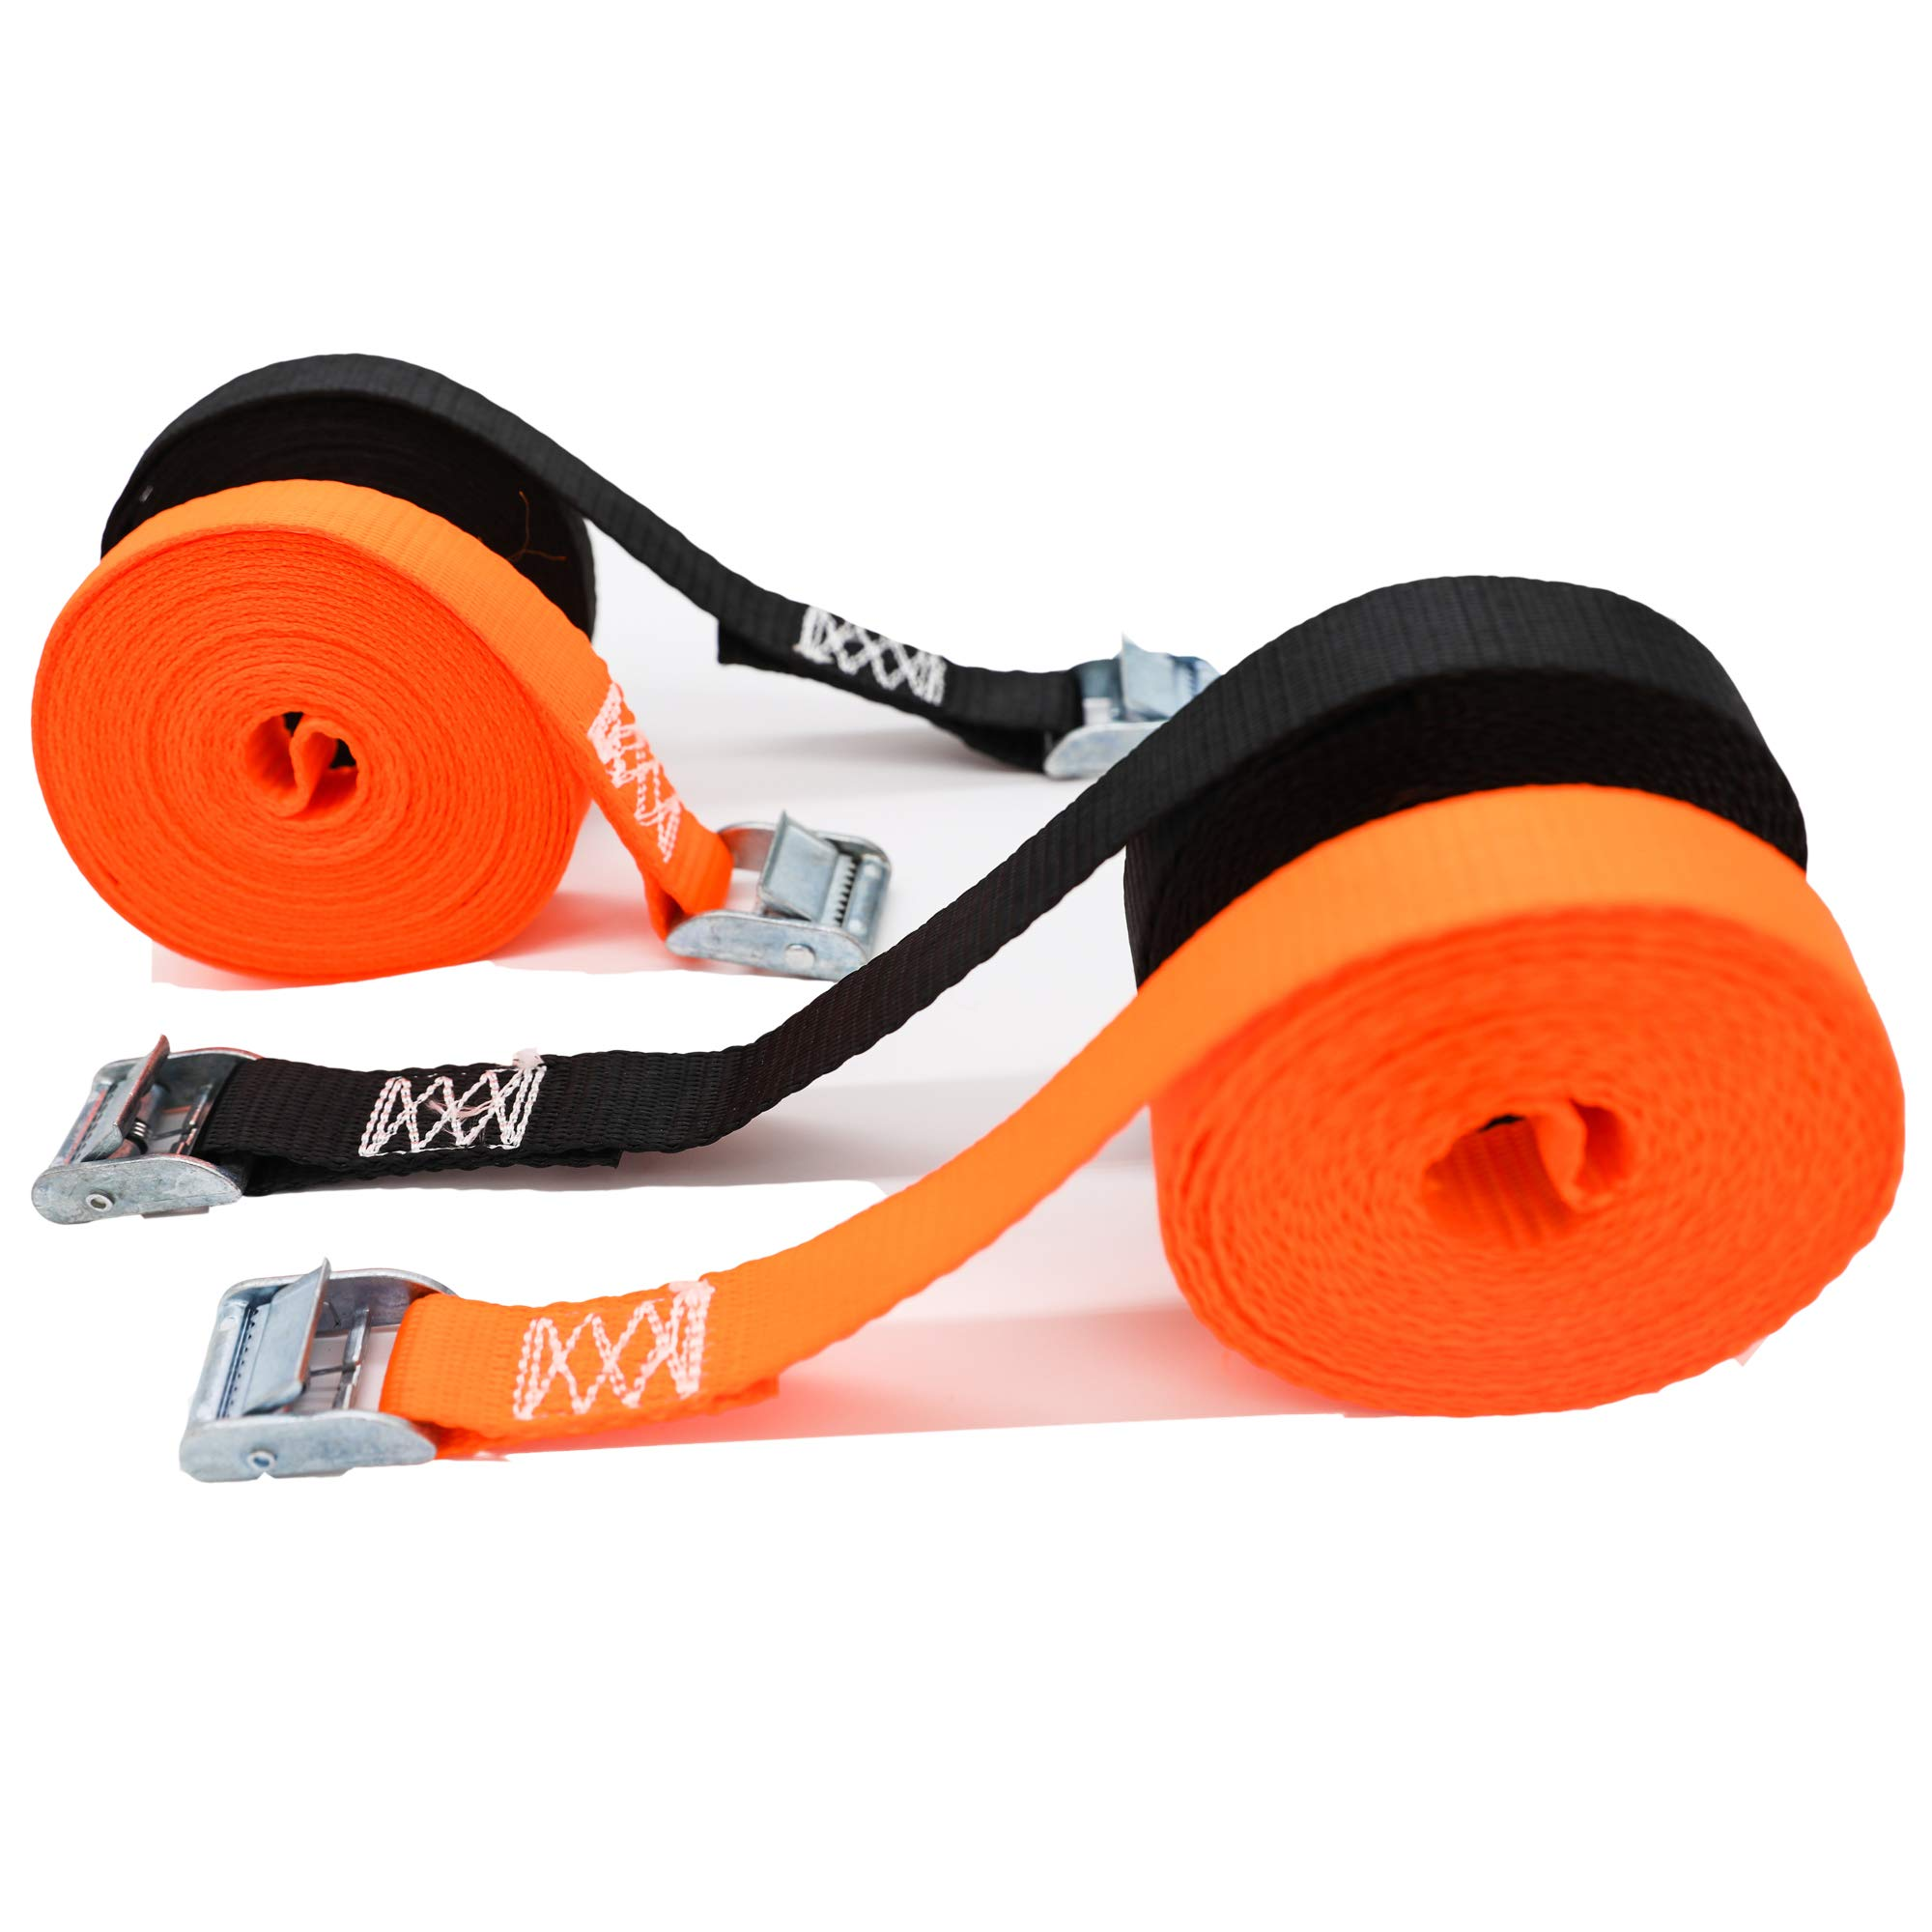 AutoService •Tie Down Straps 16' x 1'' Heavy Duty Lashing Straps Adjustable Cam Buckle Tie-Down Straps for Motorcycle, Cargo, Trucks,Trailer,Dirt Bikes Black/Orange 4 Pack by AutoService